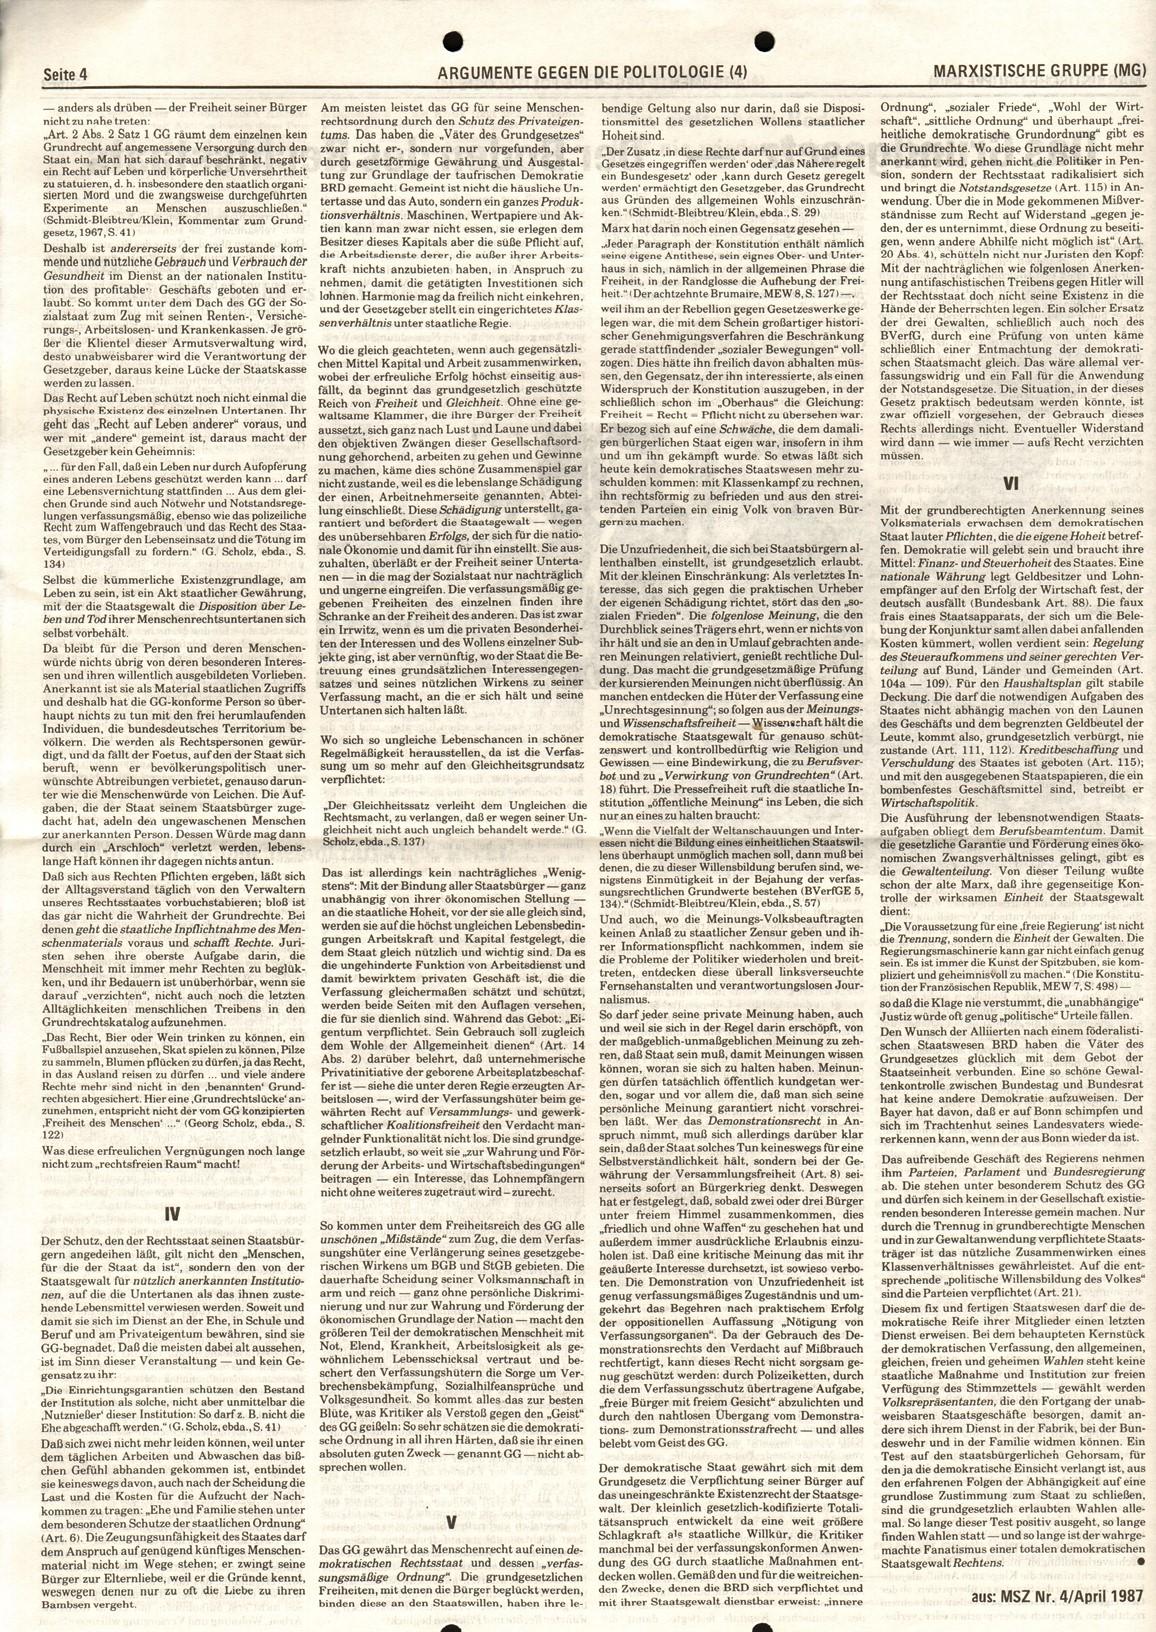 MG_Argumente_19870400_Pol_Antifaschismus_04